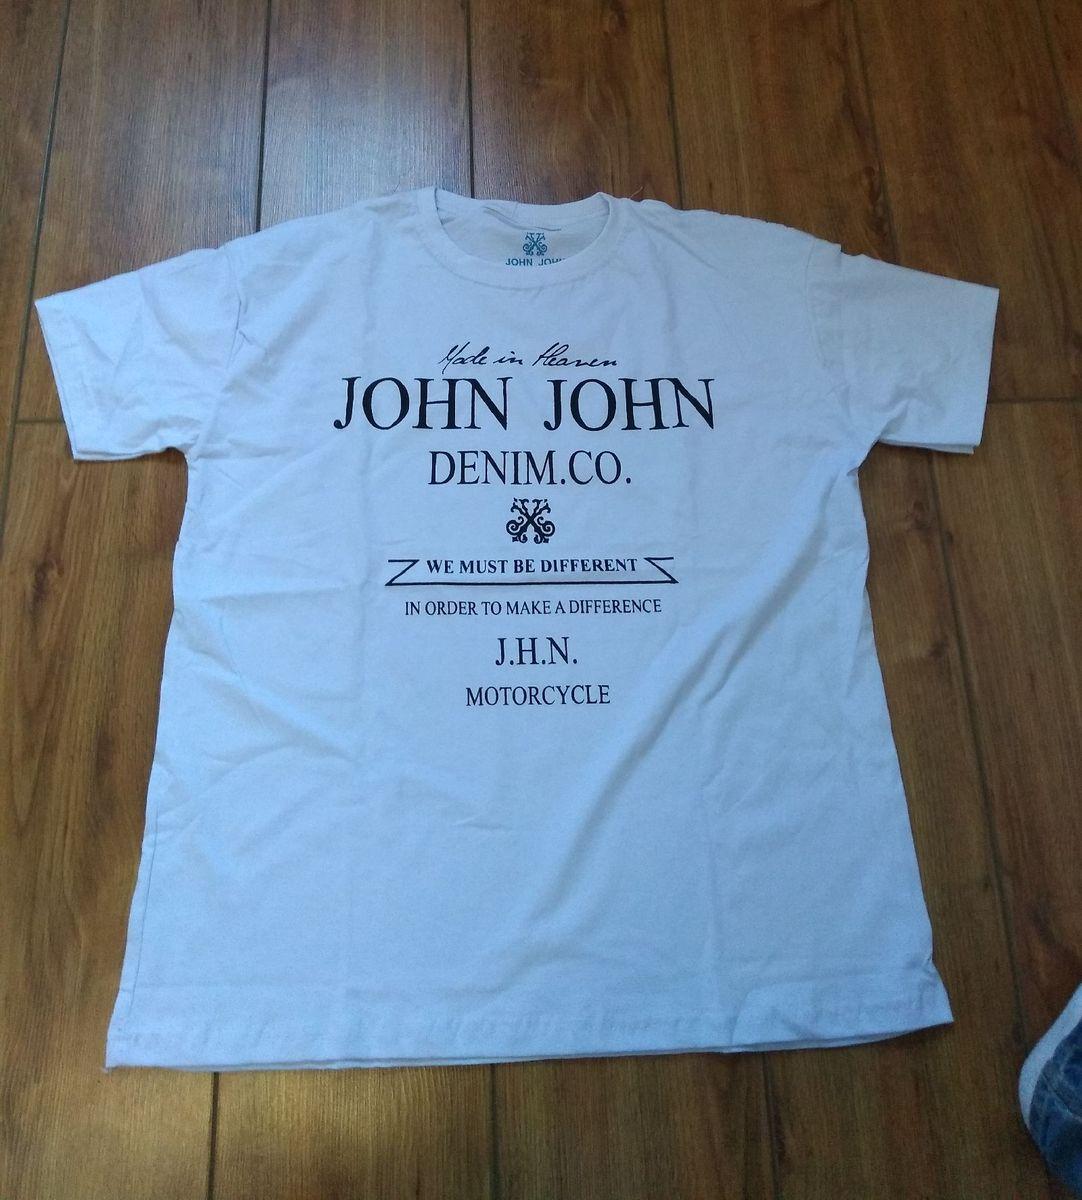 b1a410f60 camiseta estampada - john john - camisetas john-john